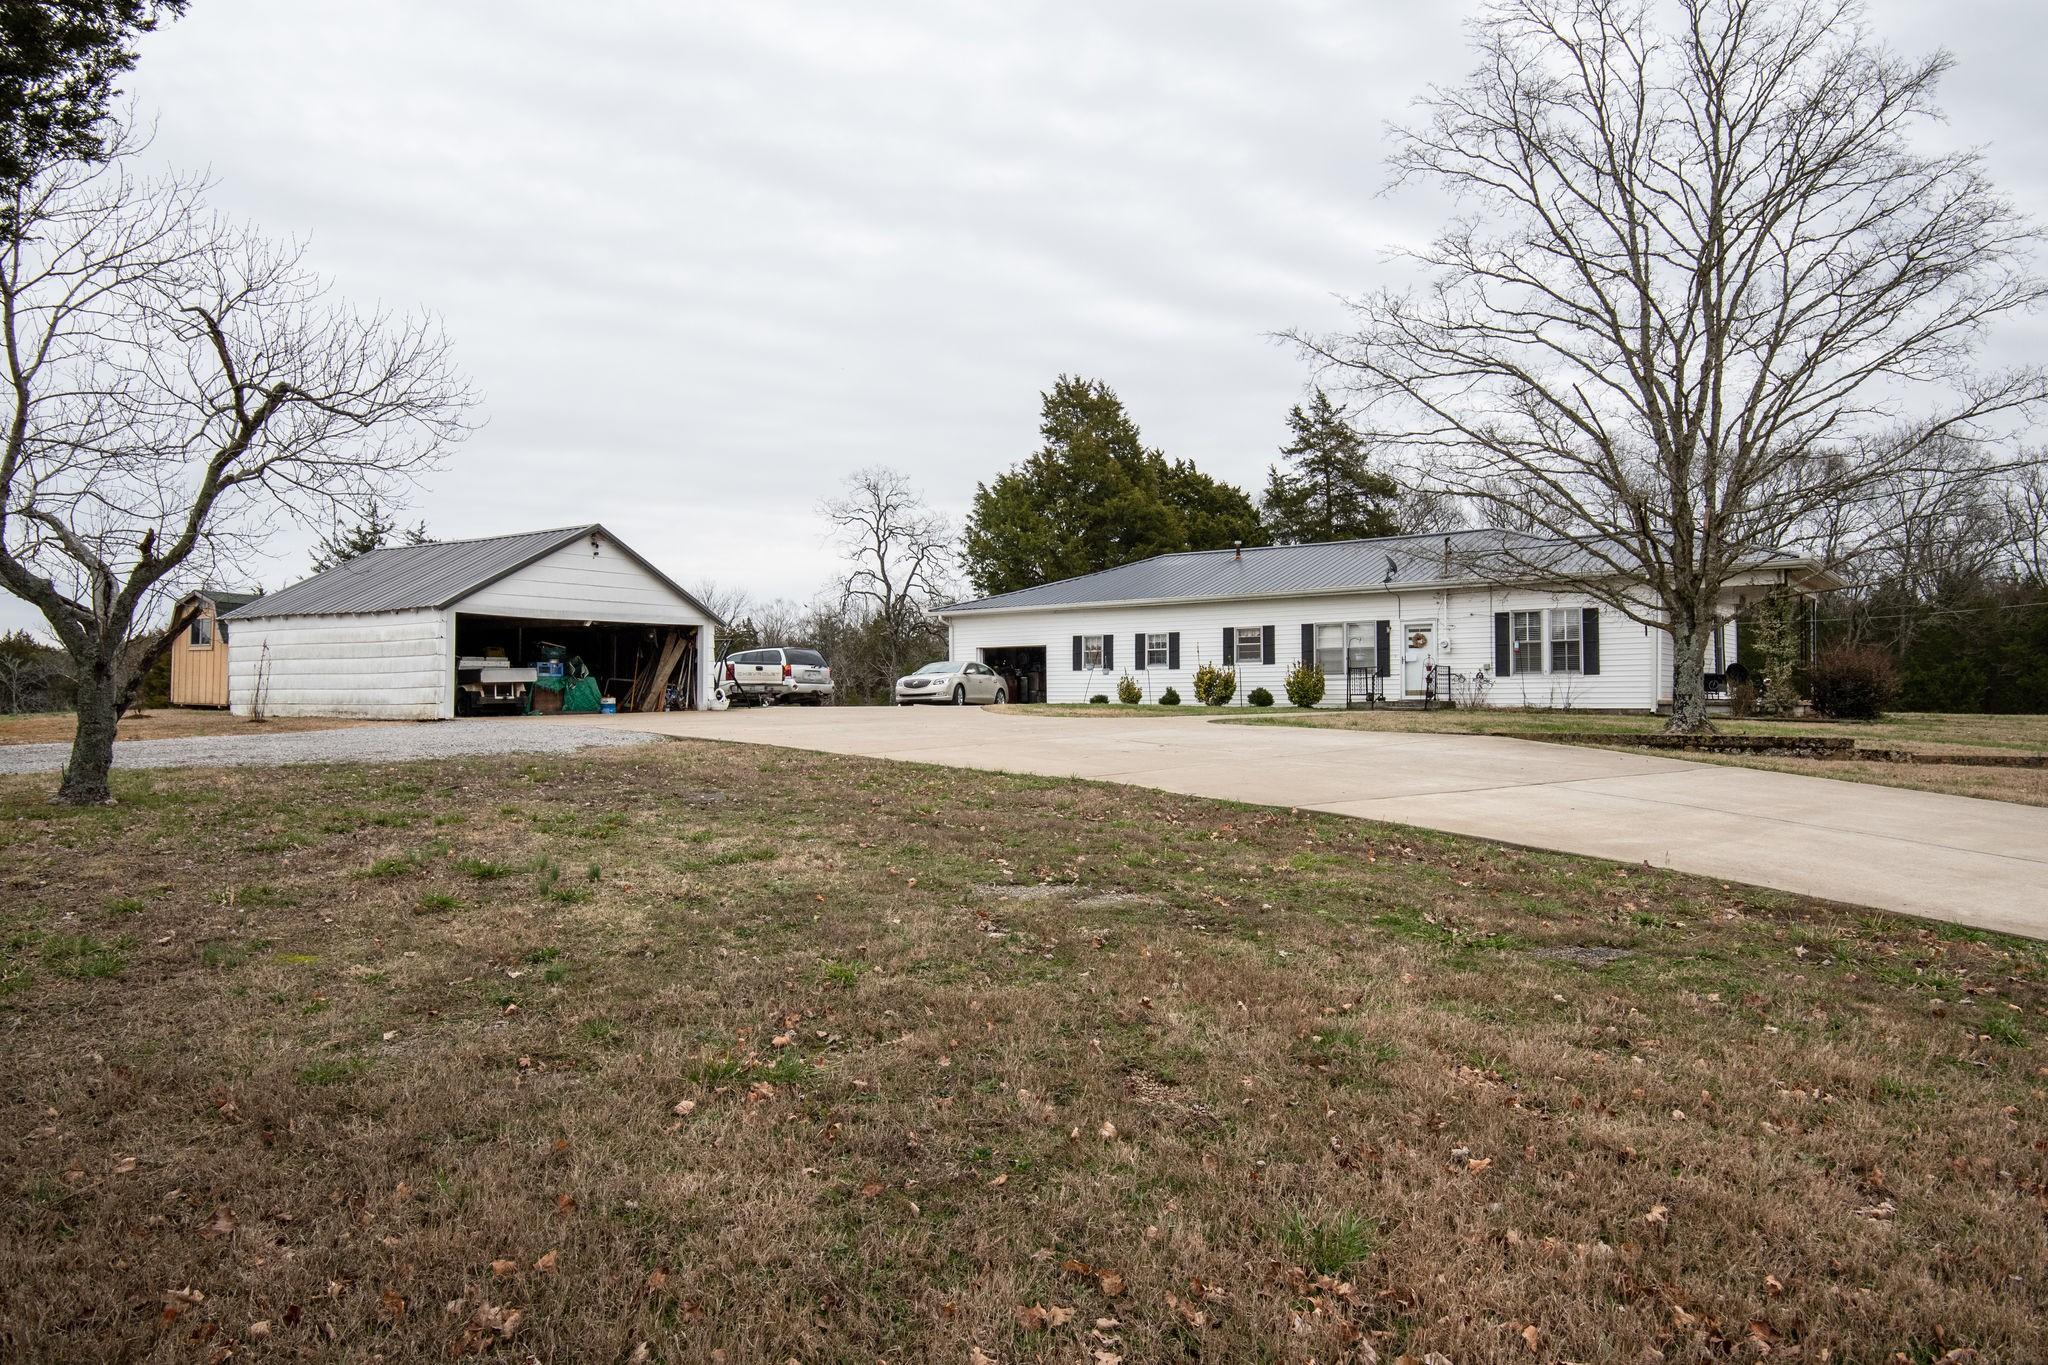 3258 Hwy 41A N, Unionville, TN 37180 - Unionville, TN real estate listing